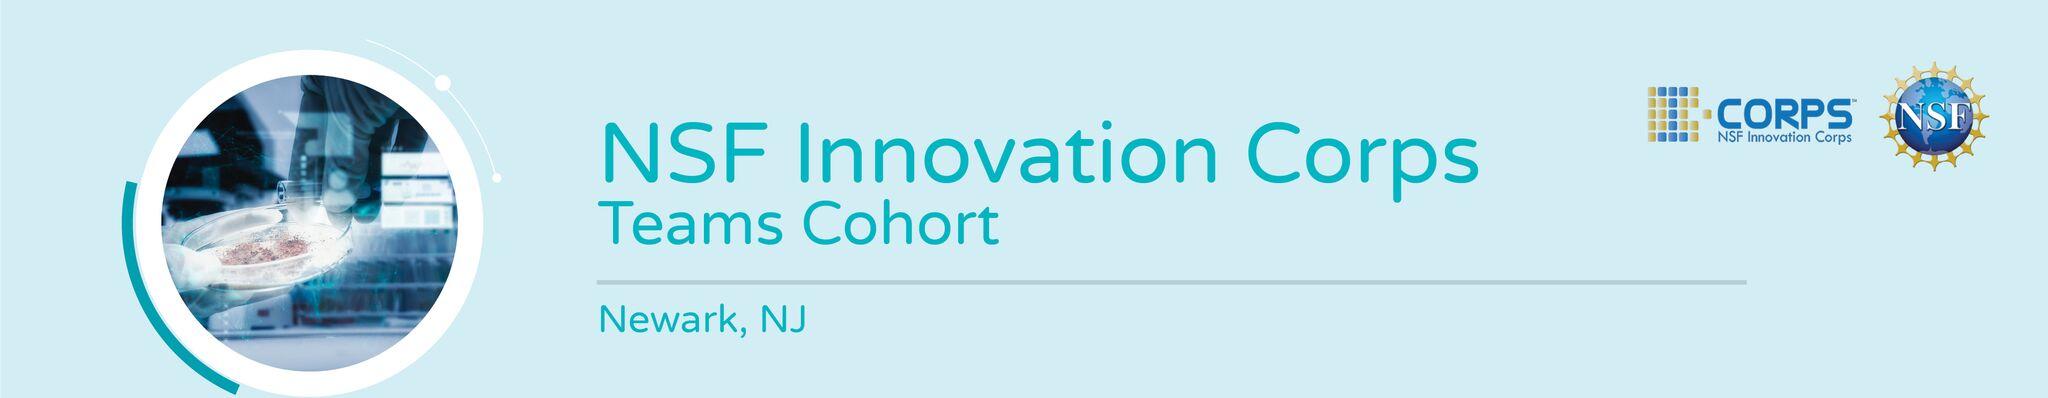 NSF Innovation Corps